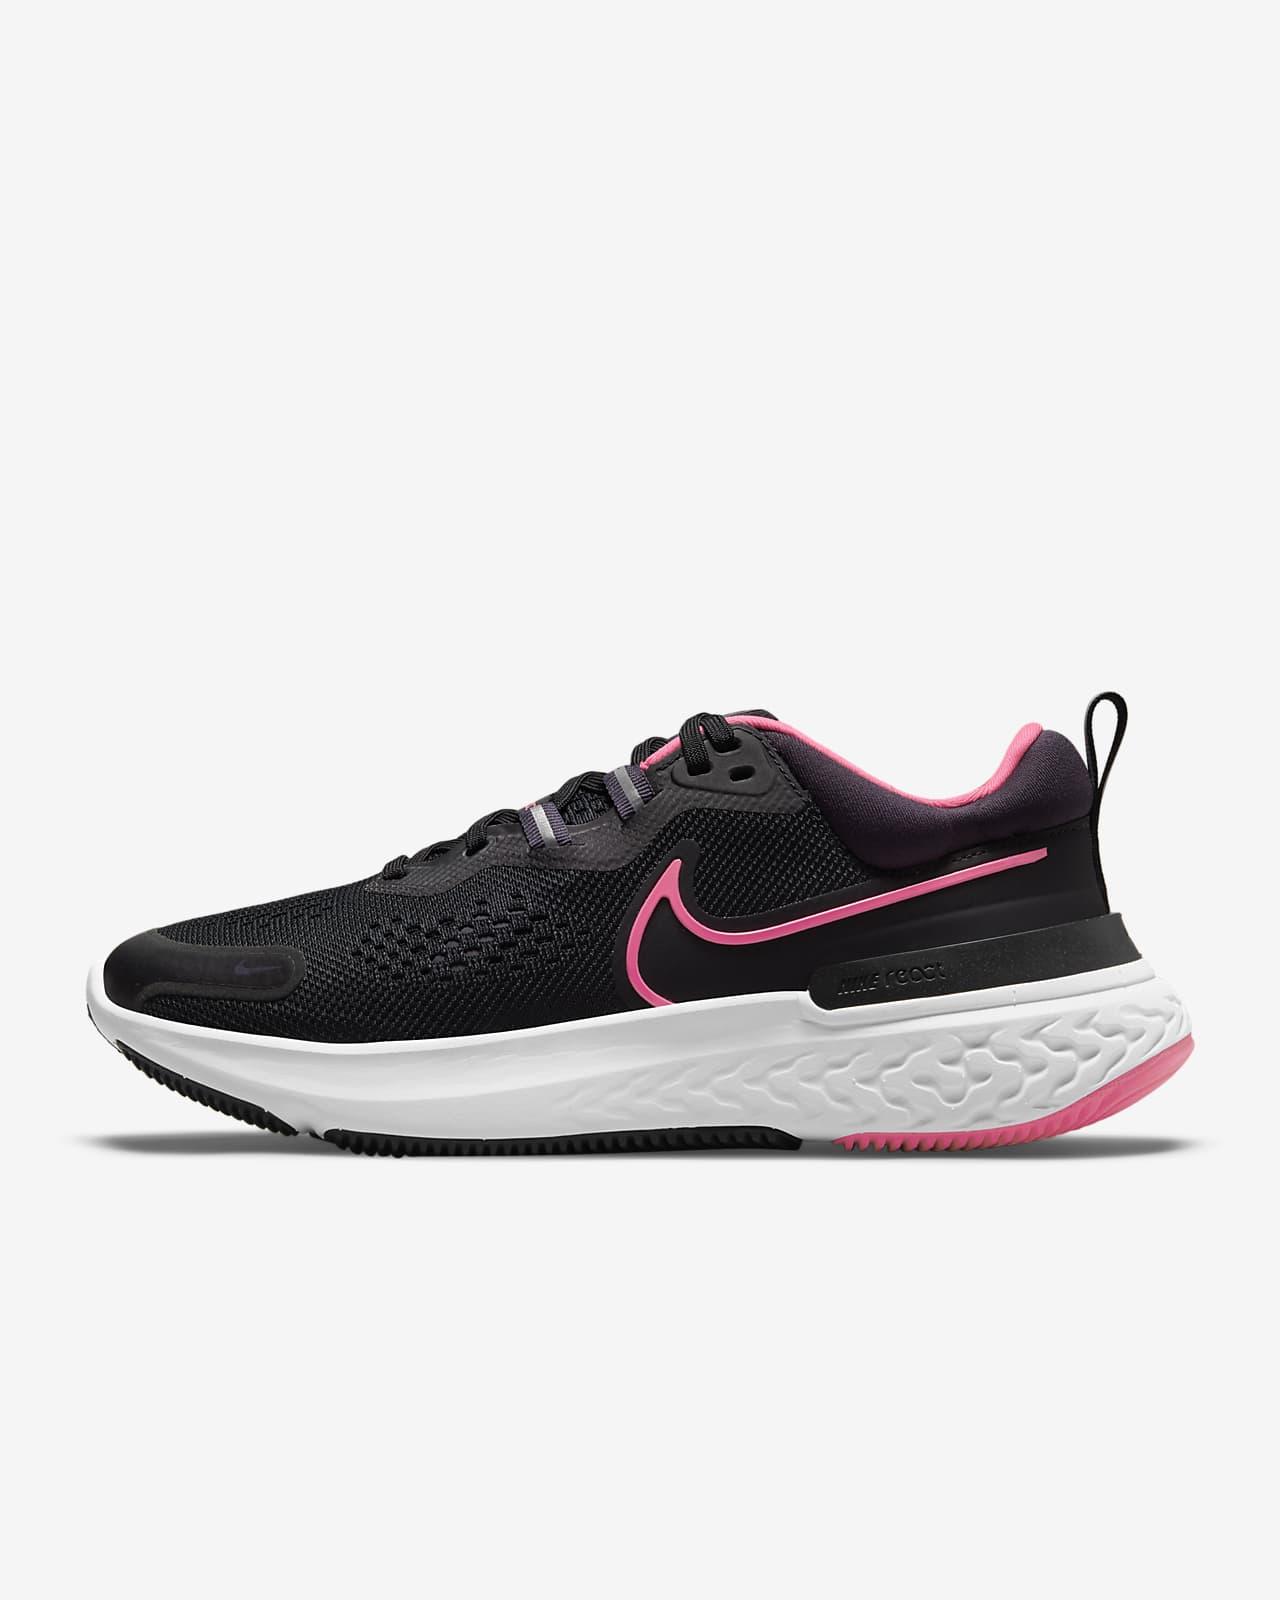 Calzado de running en carretera Nike React Miler 2 para mujer